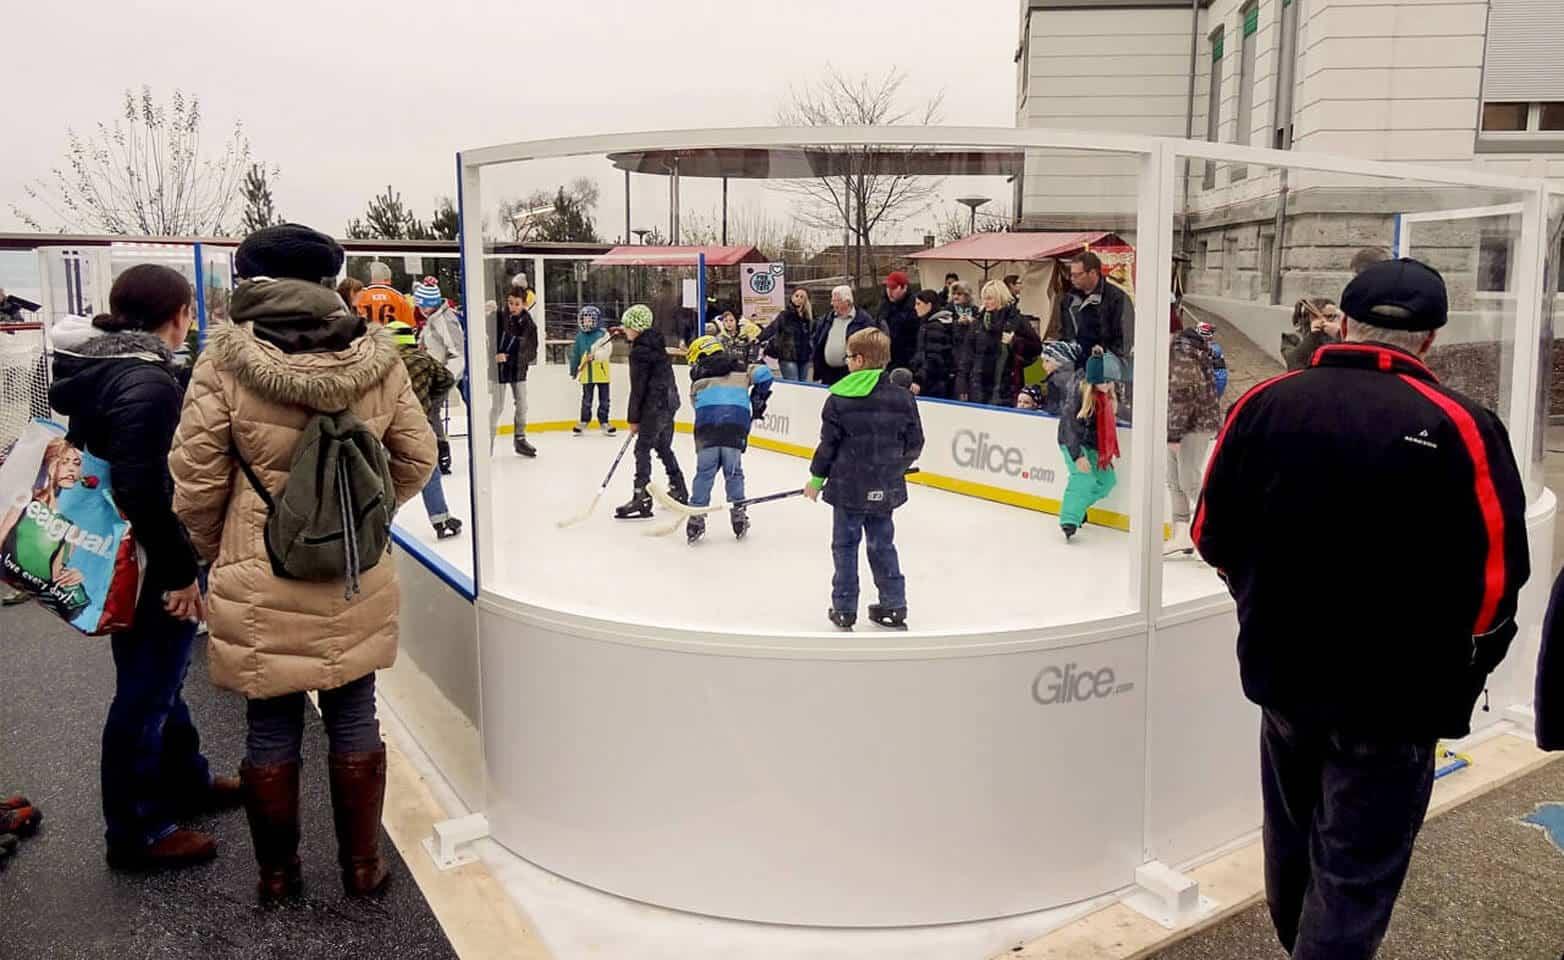 Plastic ice rink mini arena in city center